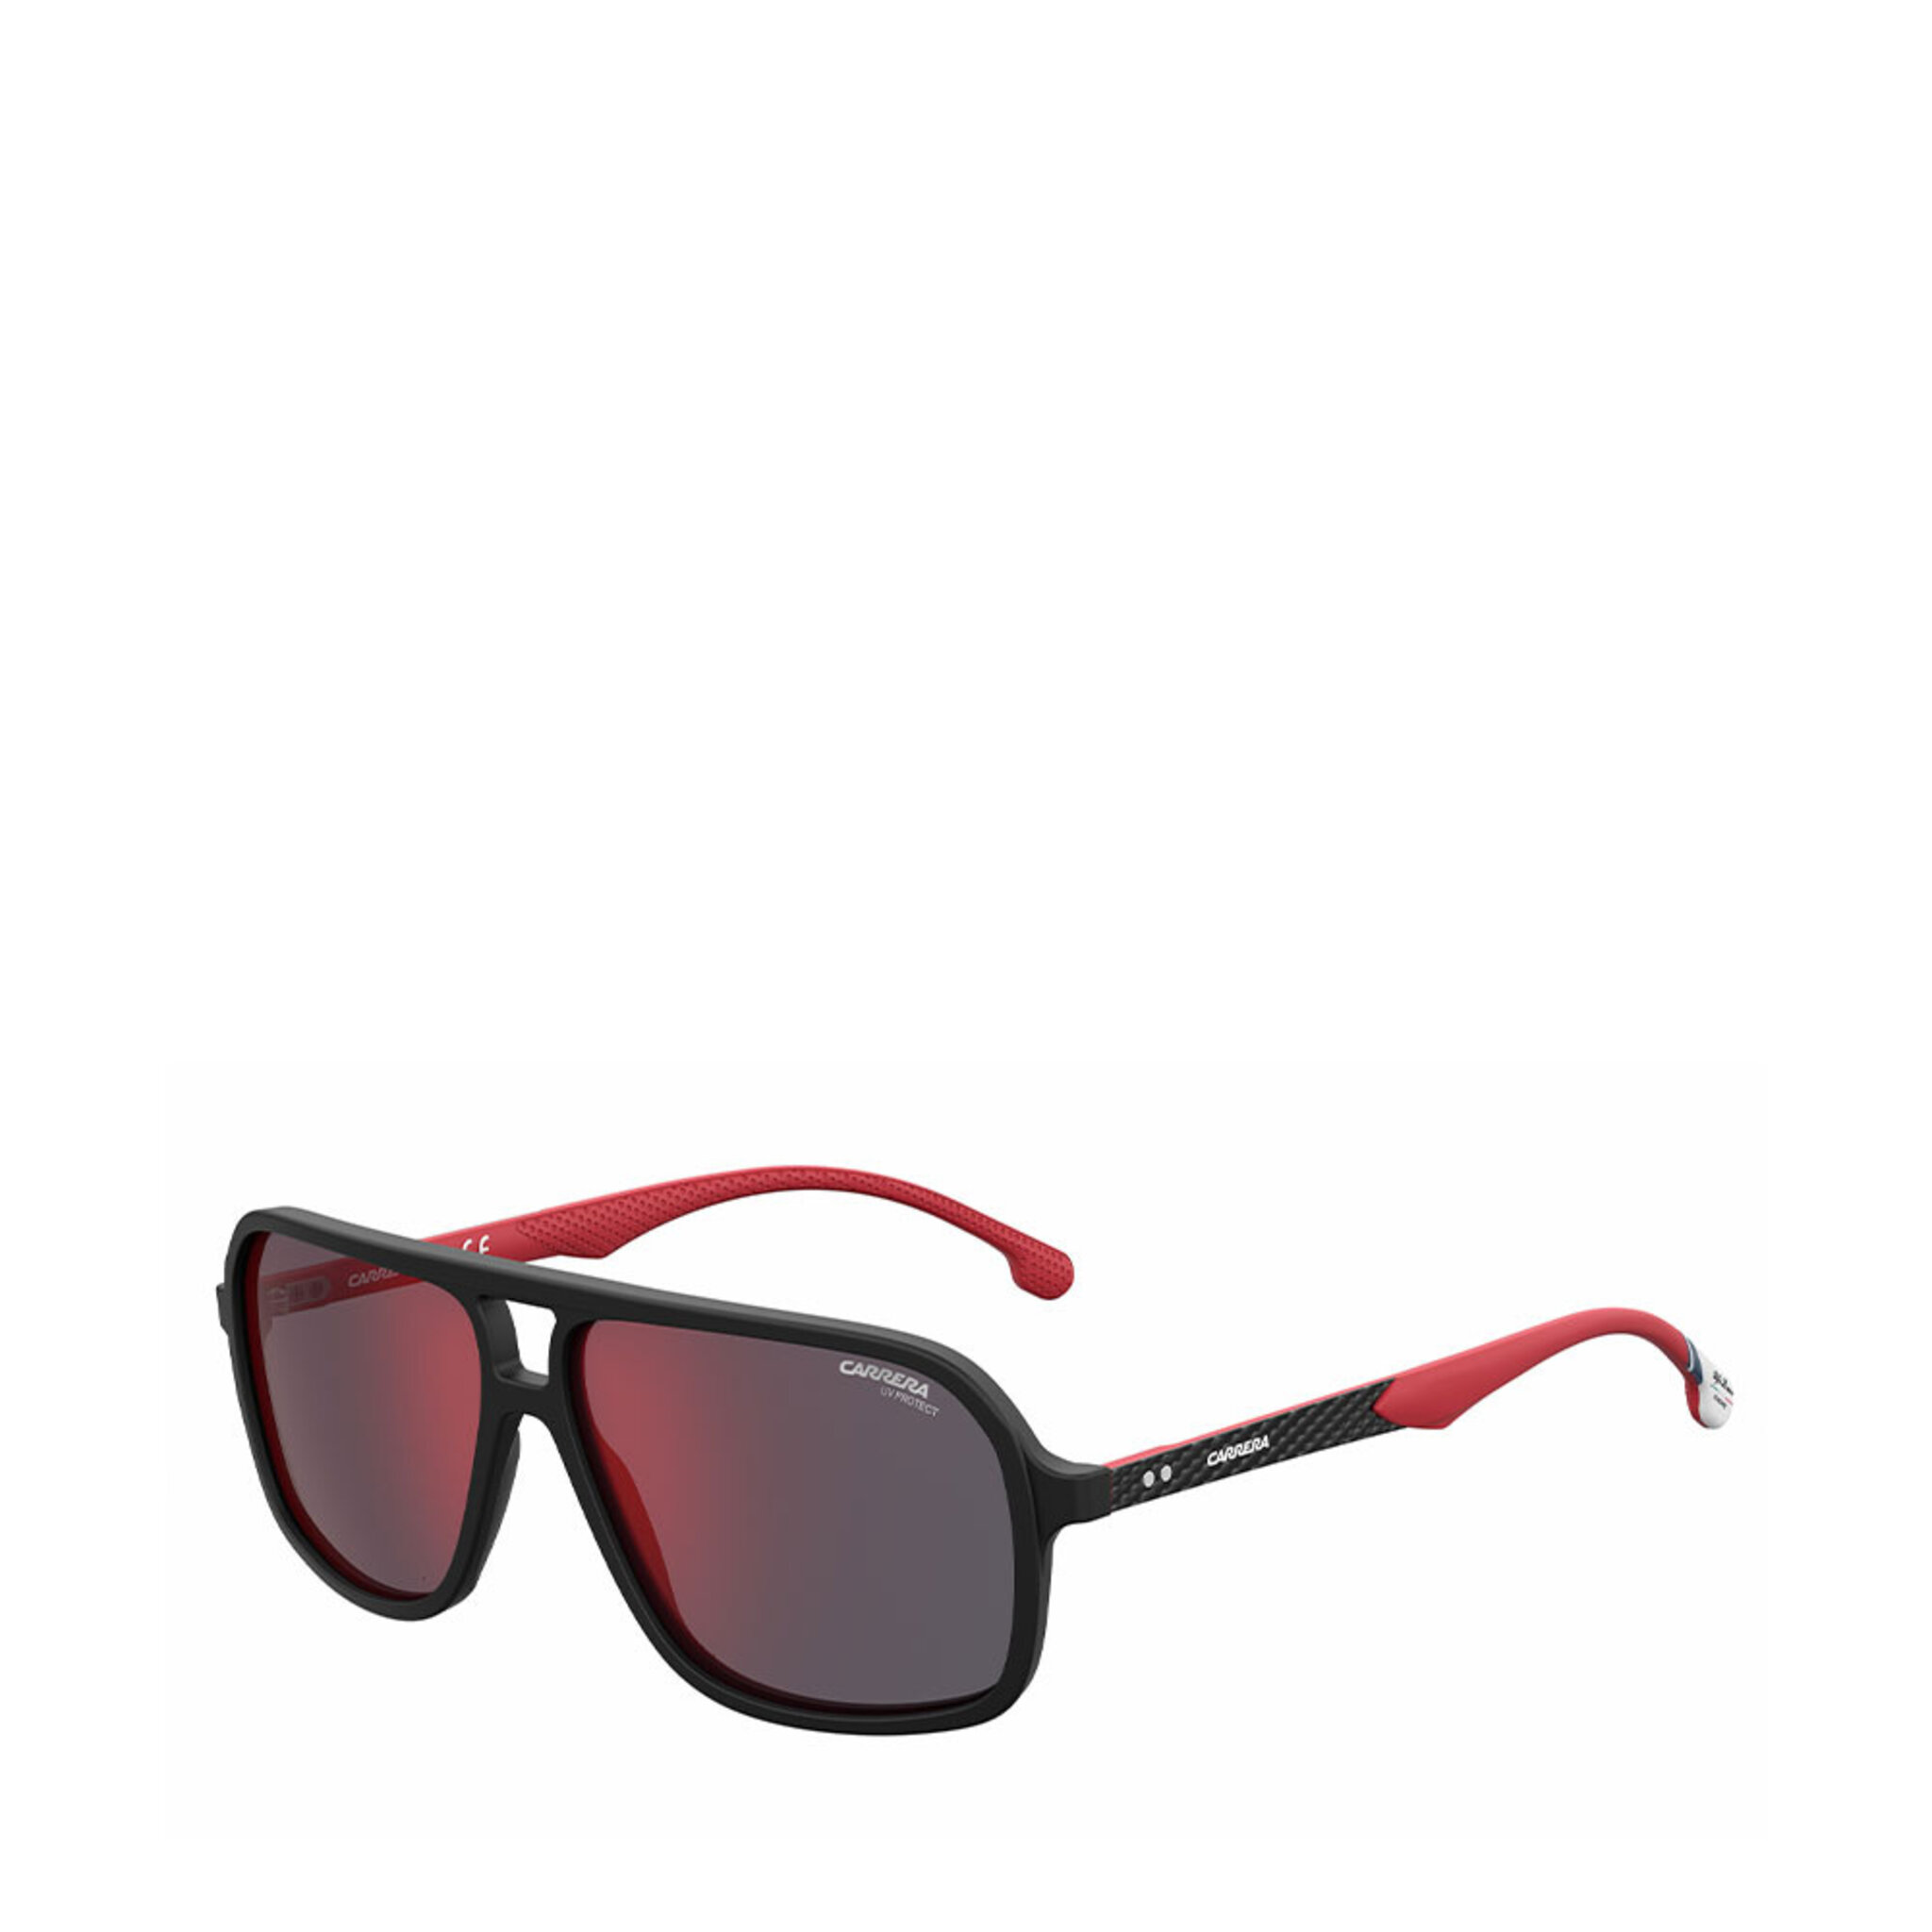 Sunglasses 8035/S, 6114